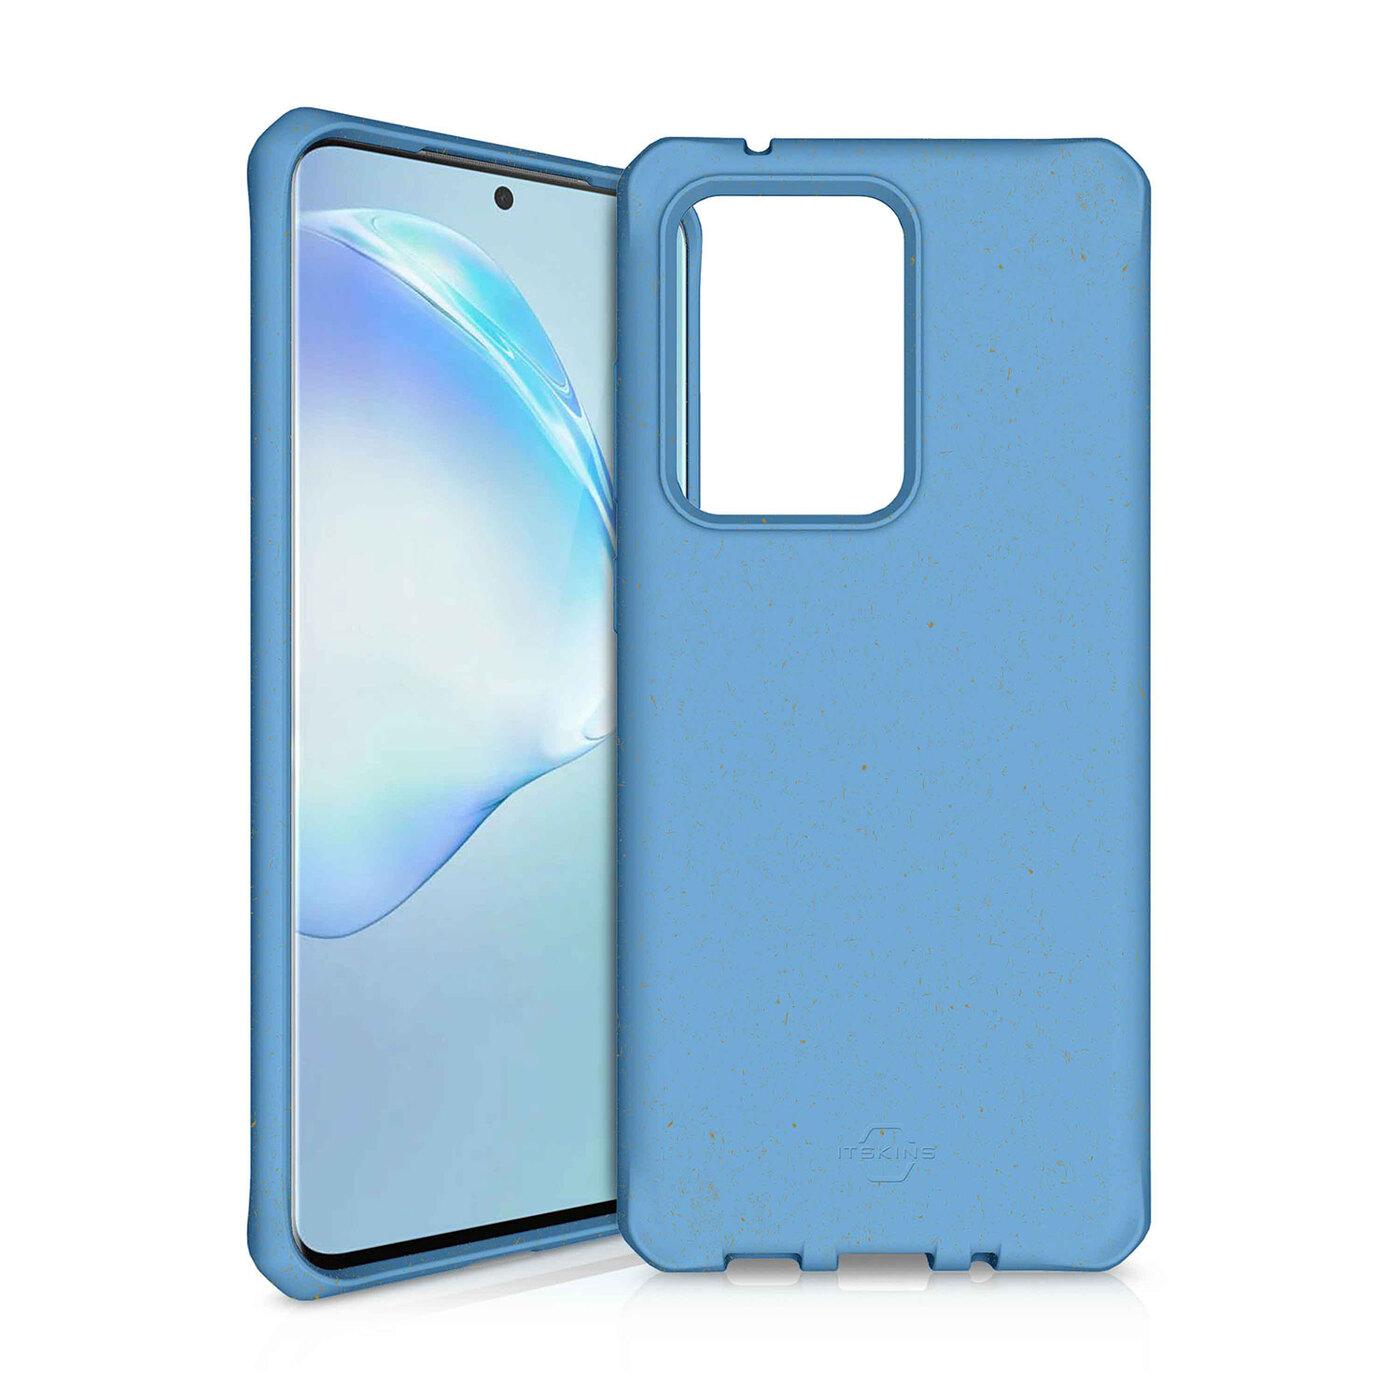 Чехол-накладка ITSKINS FERONIA BIO для Samsung Galaxy S20 Ultra, голубой